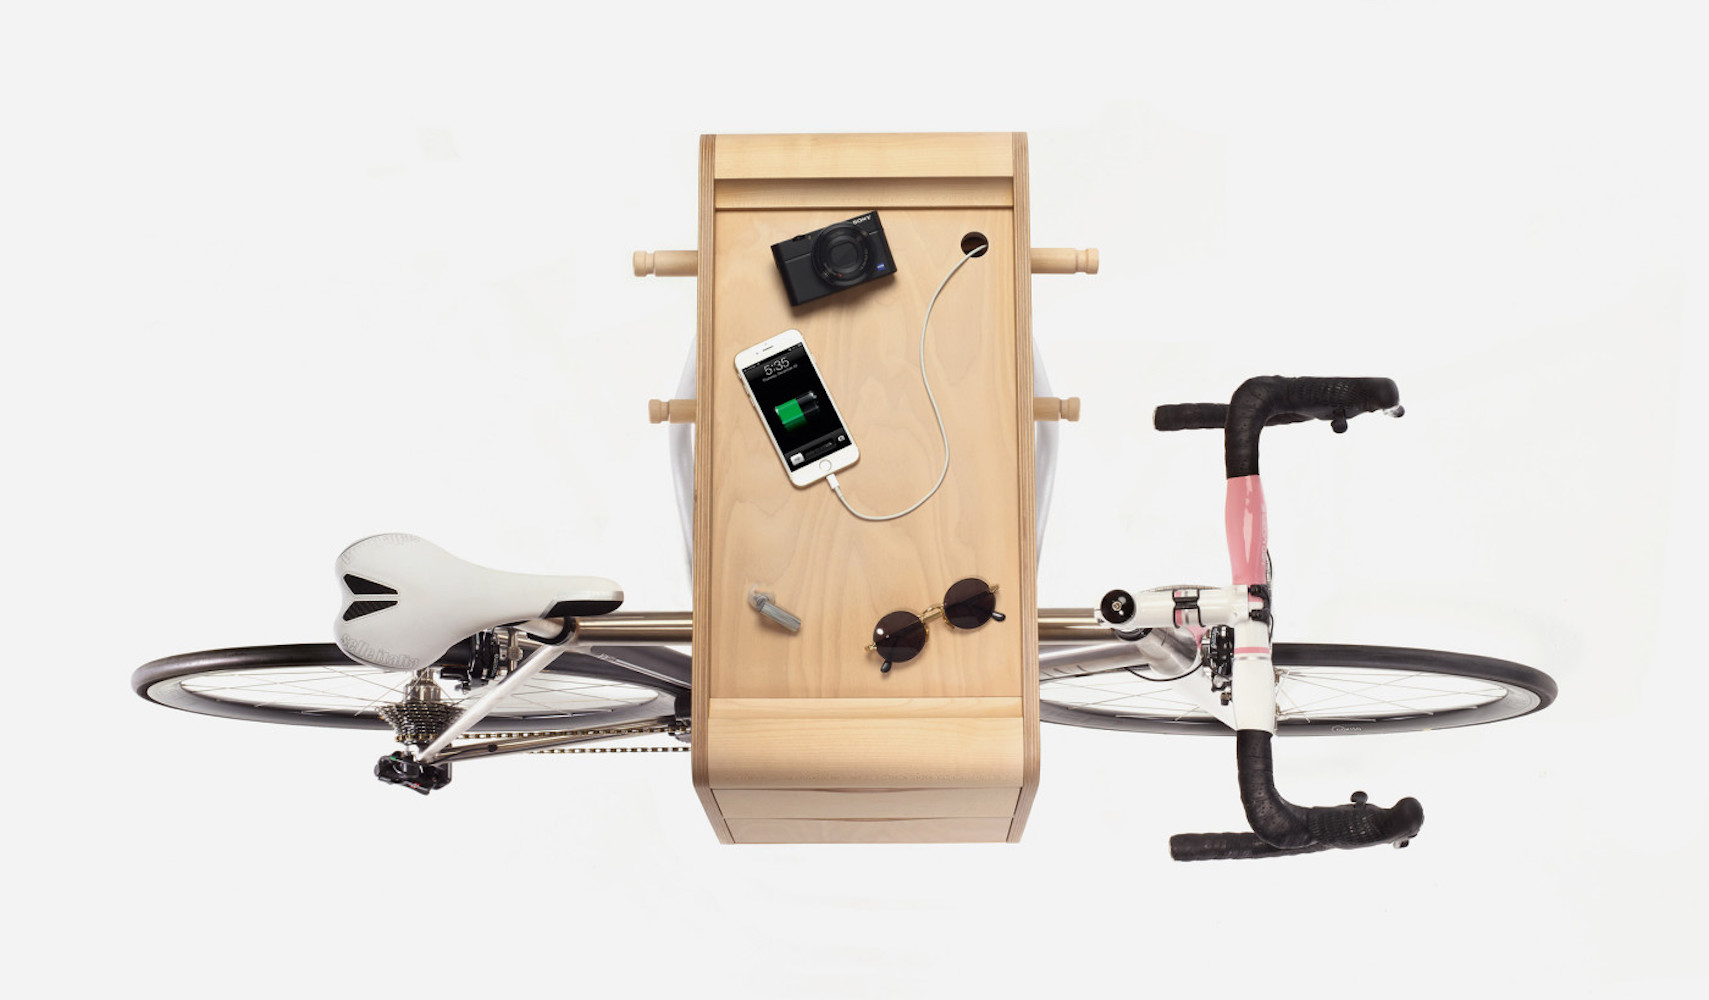 bike-butler-the-smartest-bike-stand-ever-06